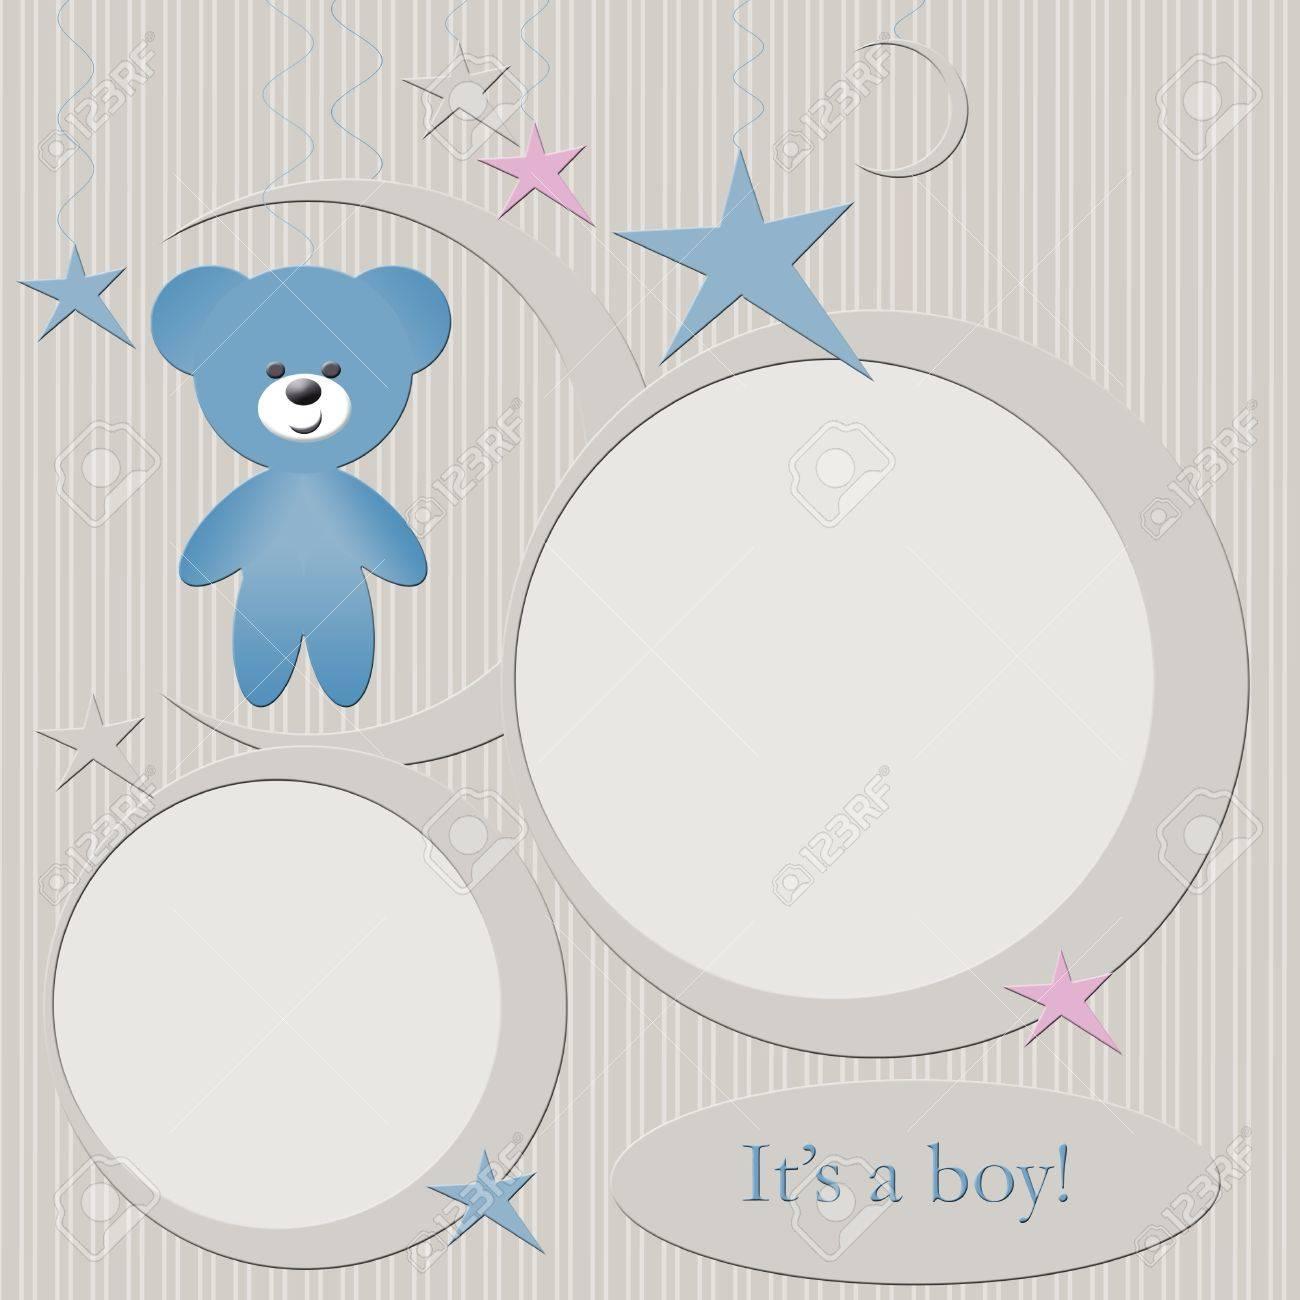 Blue babies boys photo frame Stock Photo - 11448266